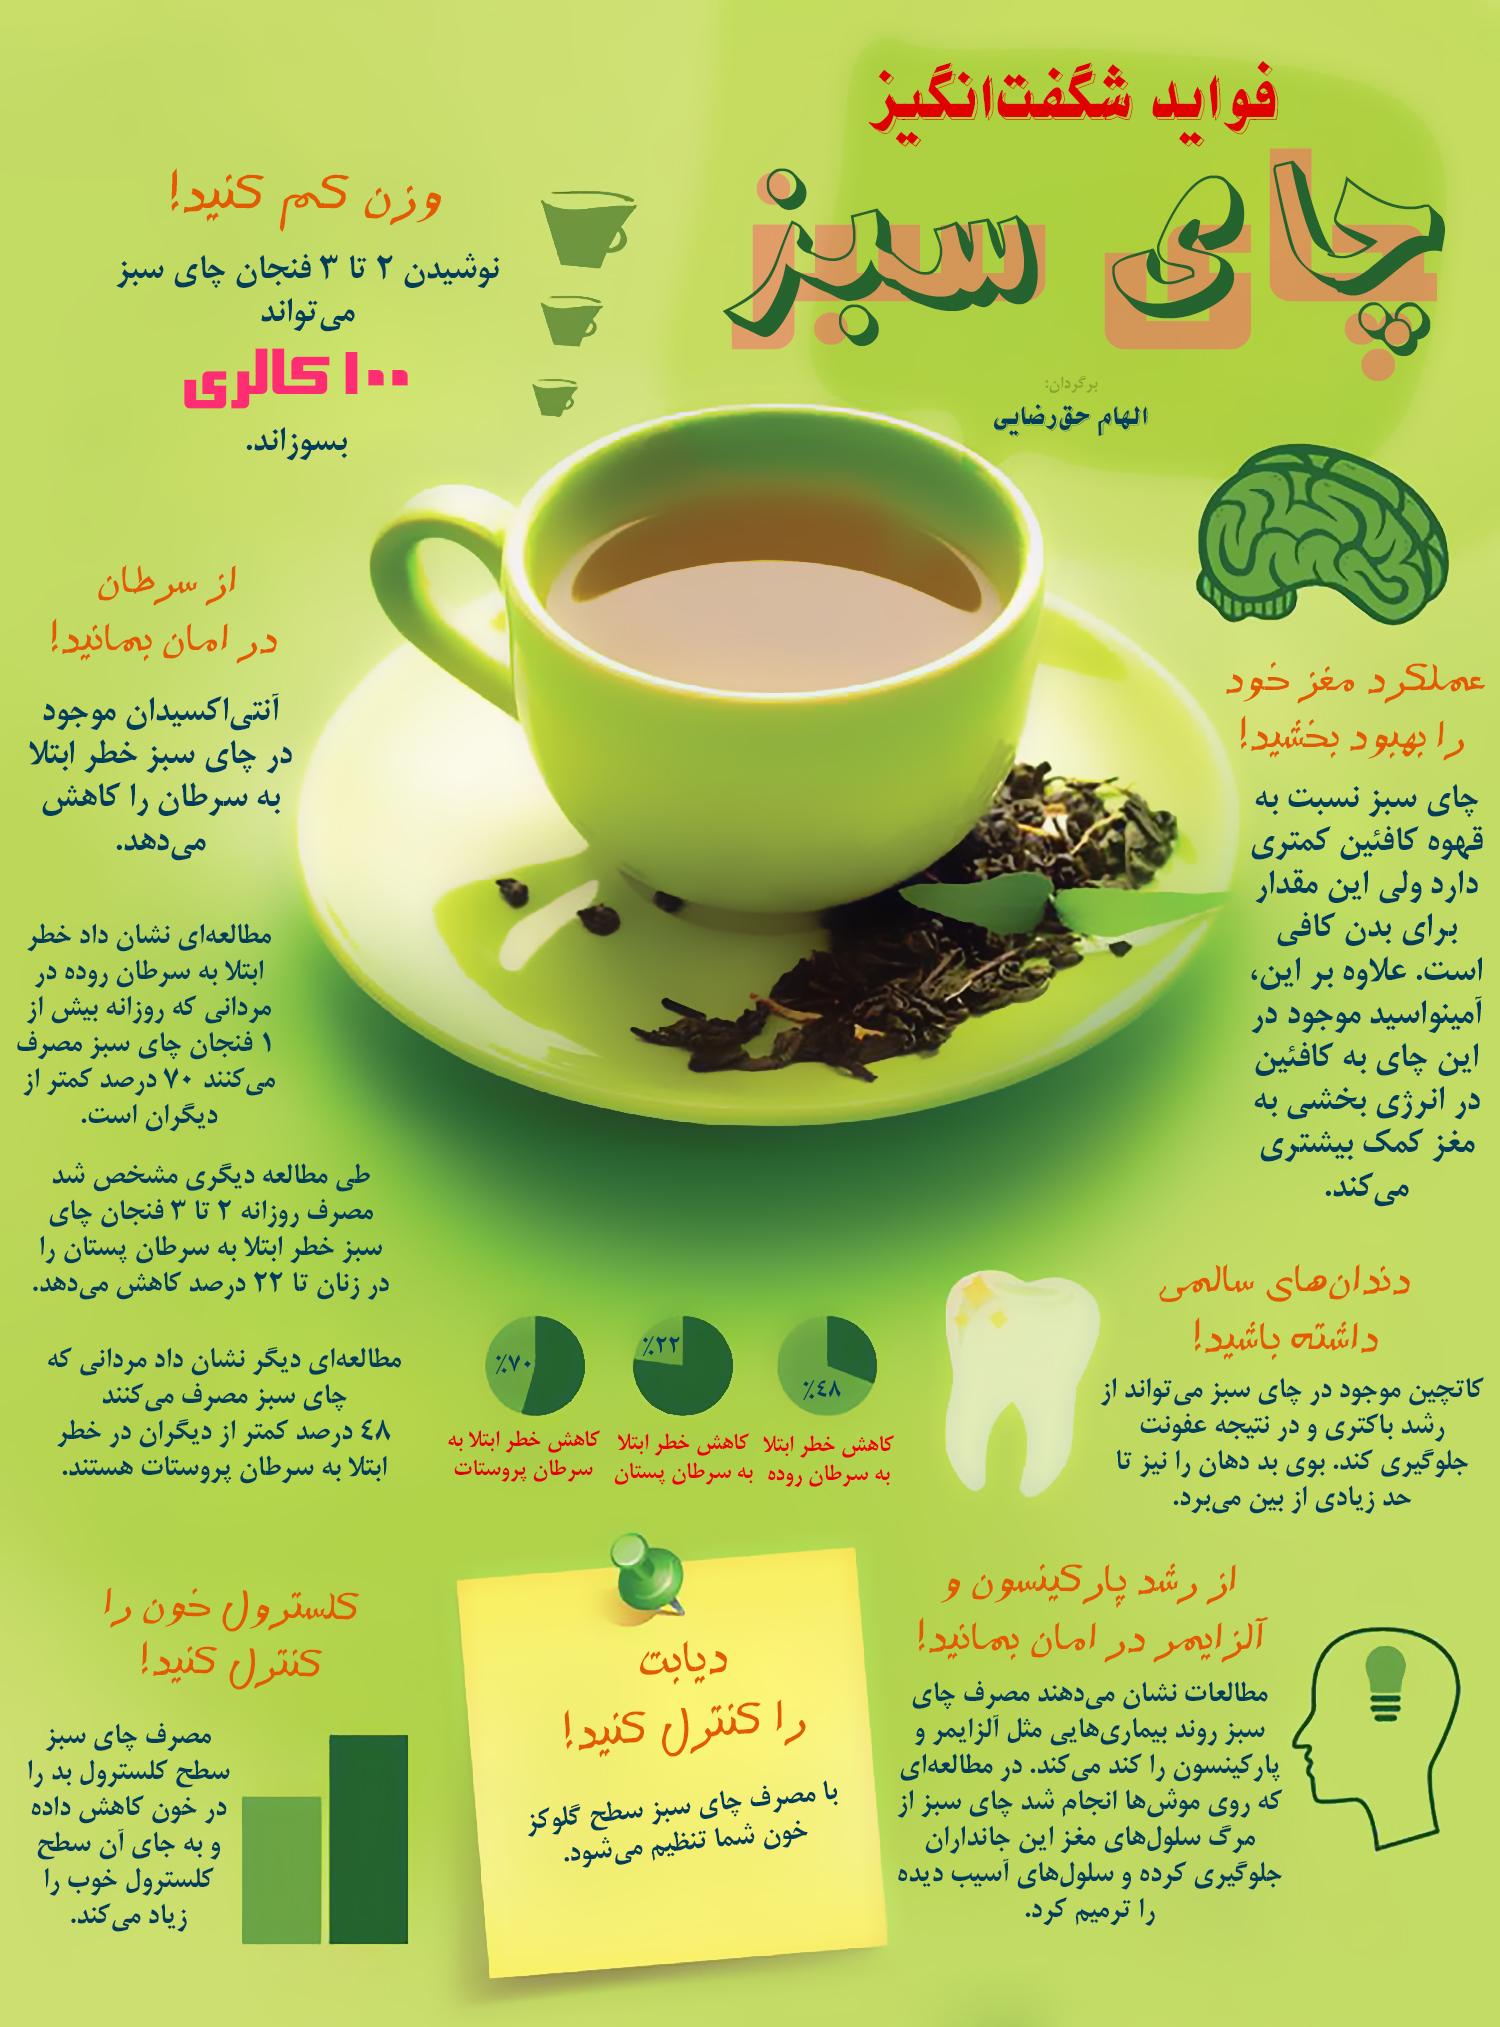 فواید شگفت انگیز چای سبز+اینفوگرافیک